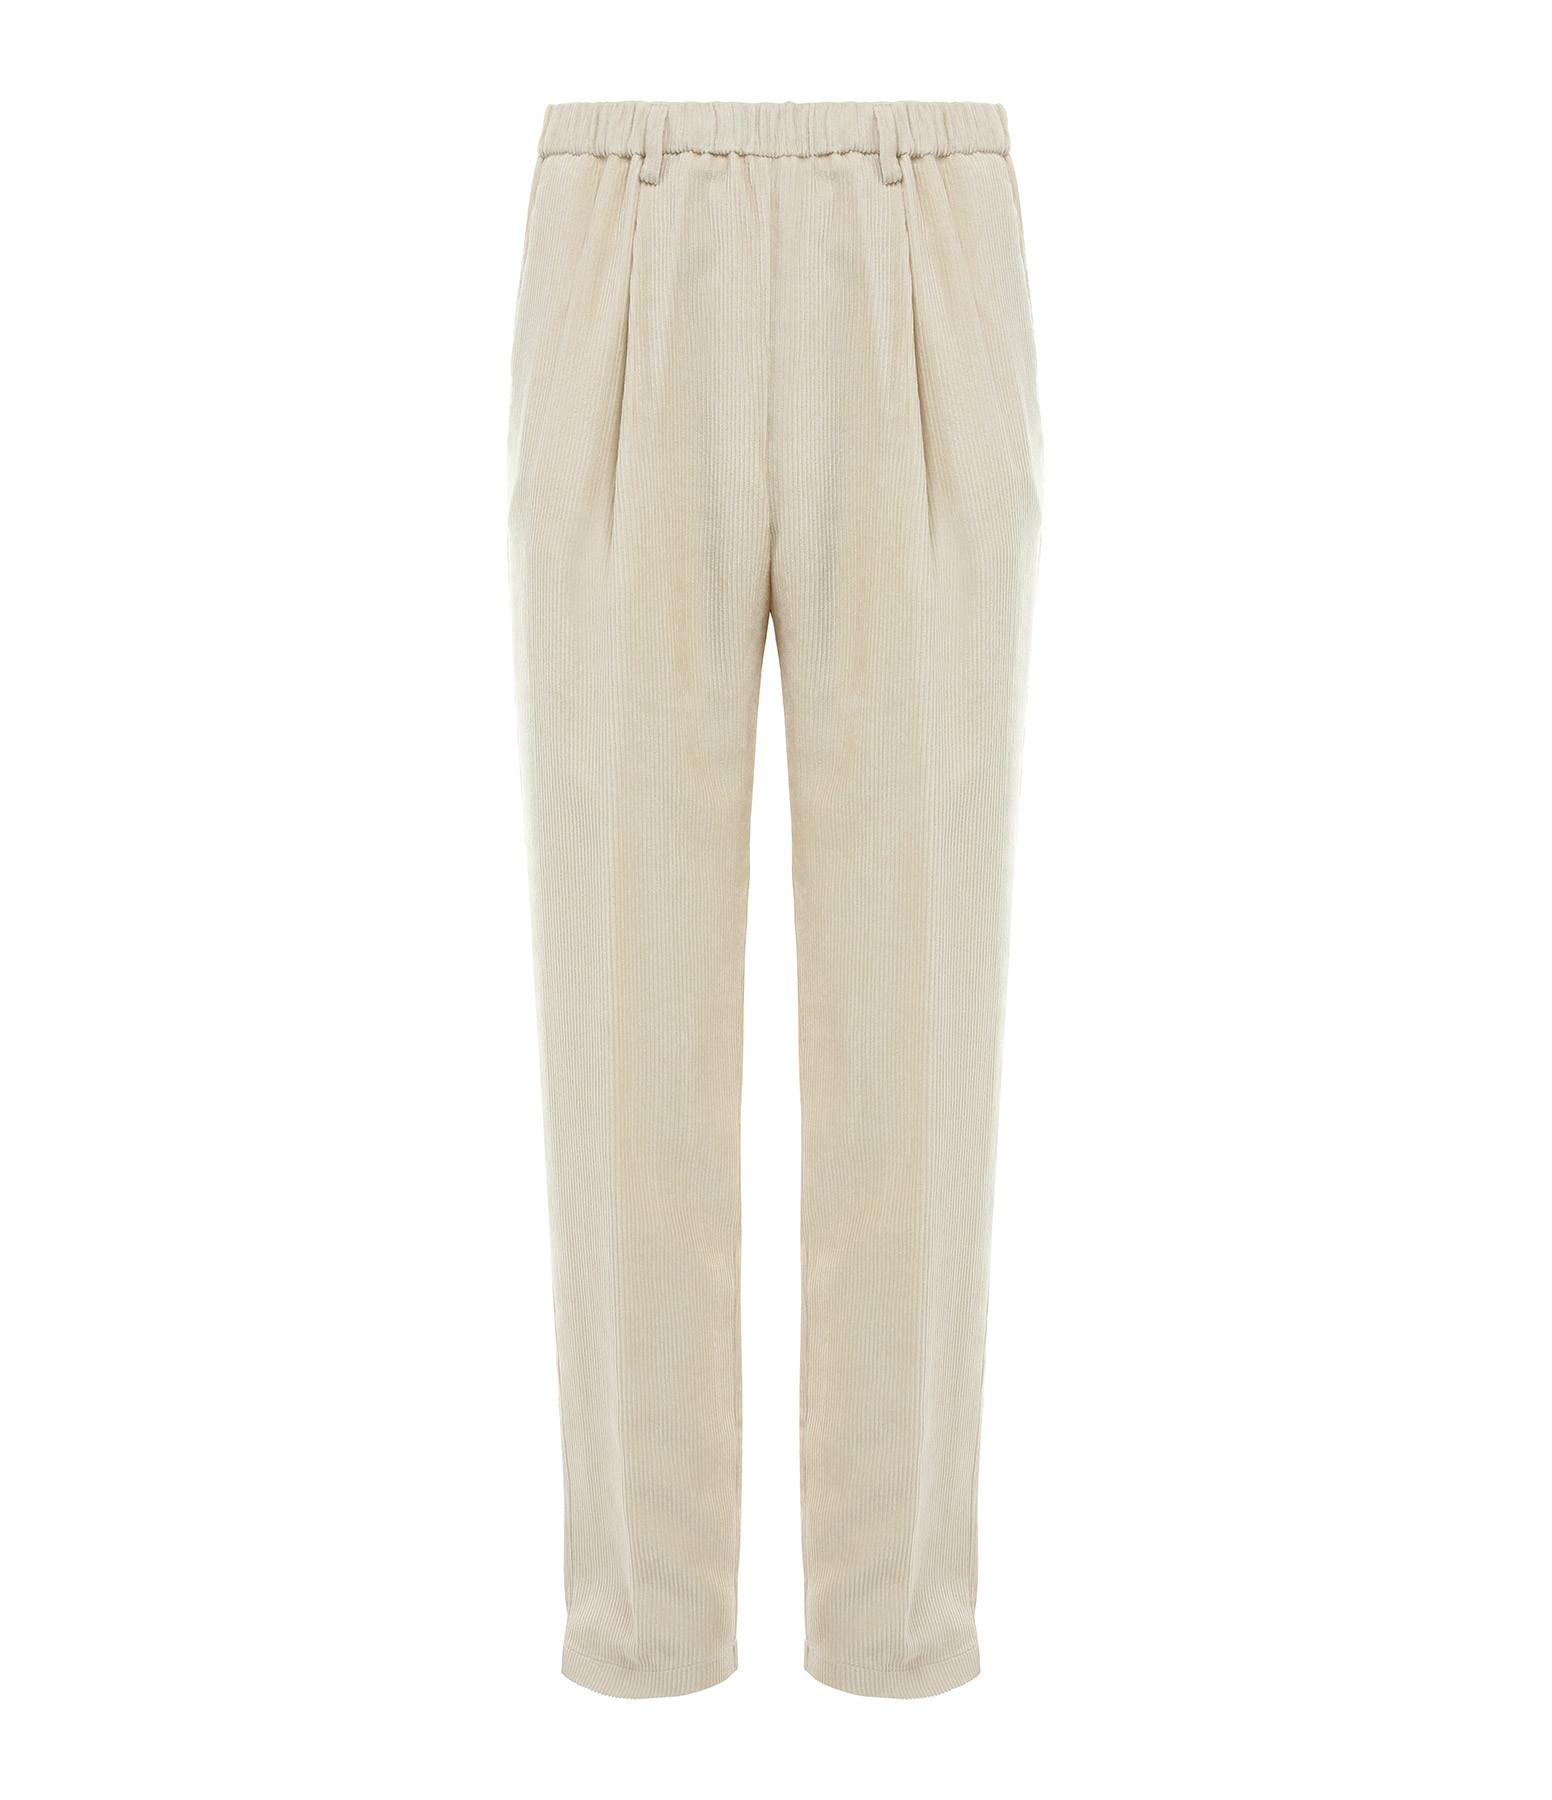 FORTE_FORTE - Pantalon Velours Fluide Beige